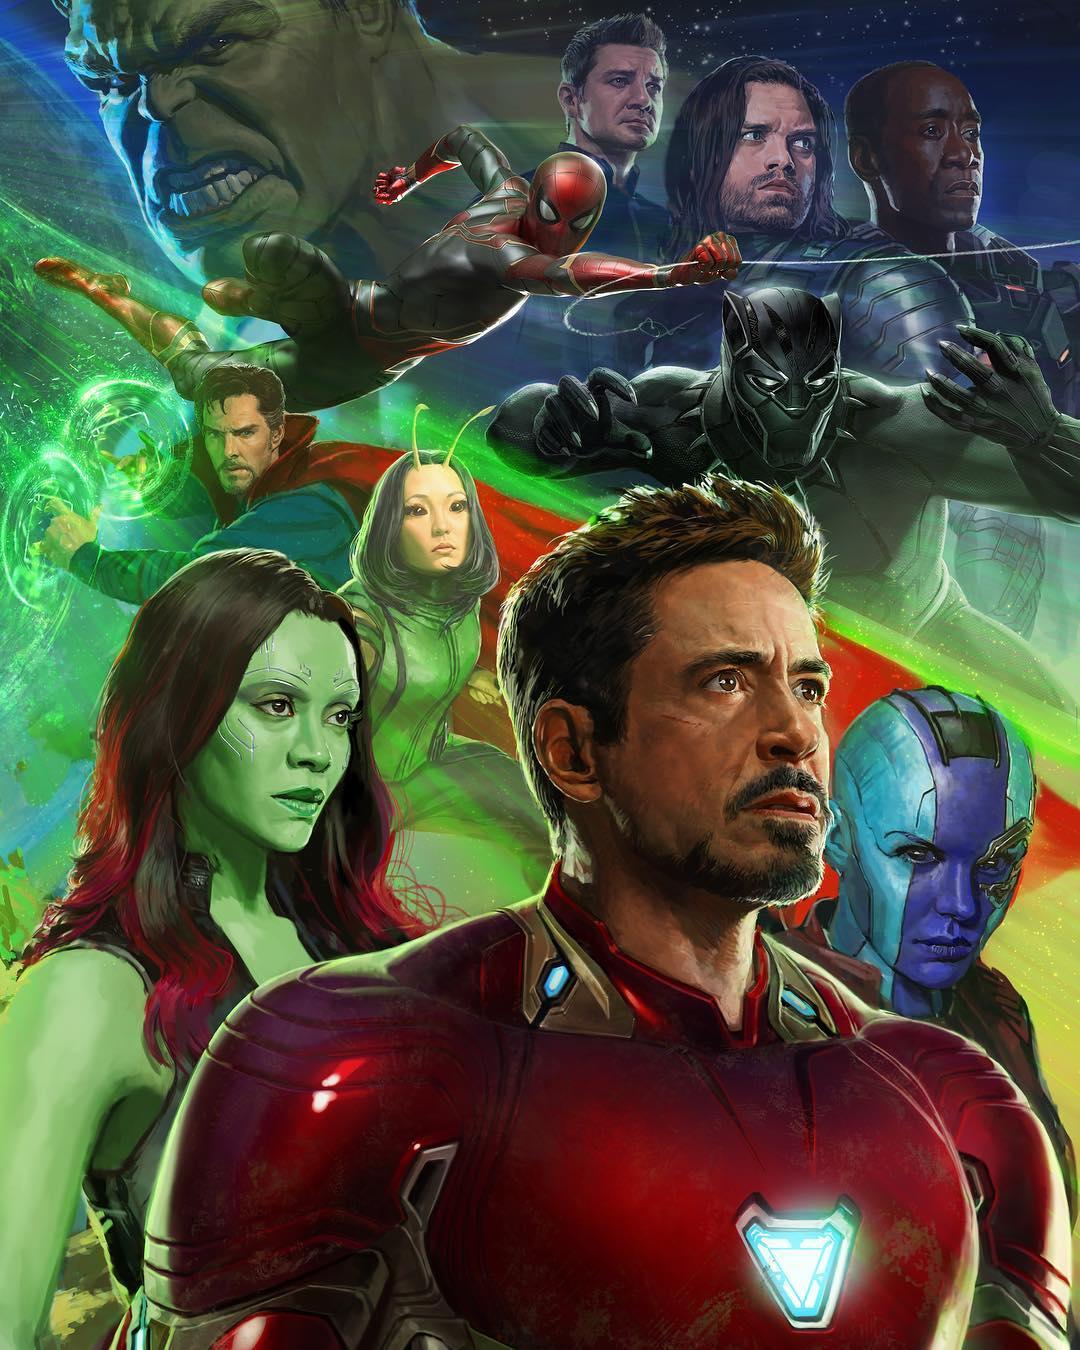 Avengers: Infinity War 2017 SDCC Poster Art by Ryan Meinerding